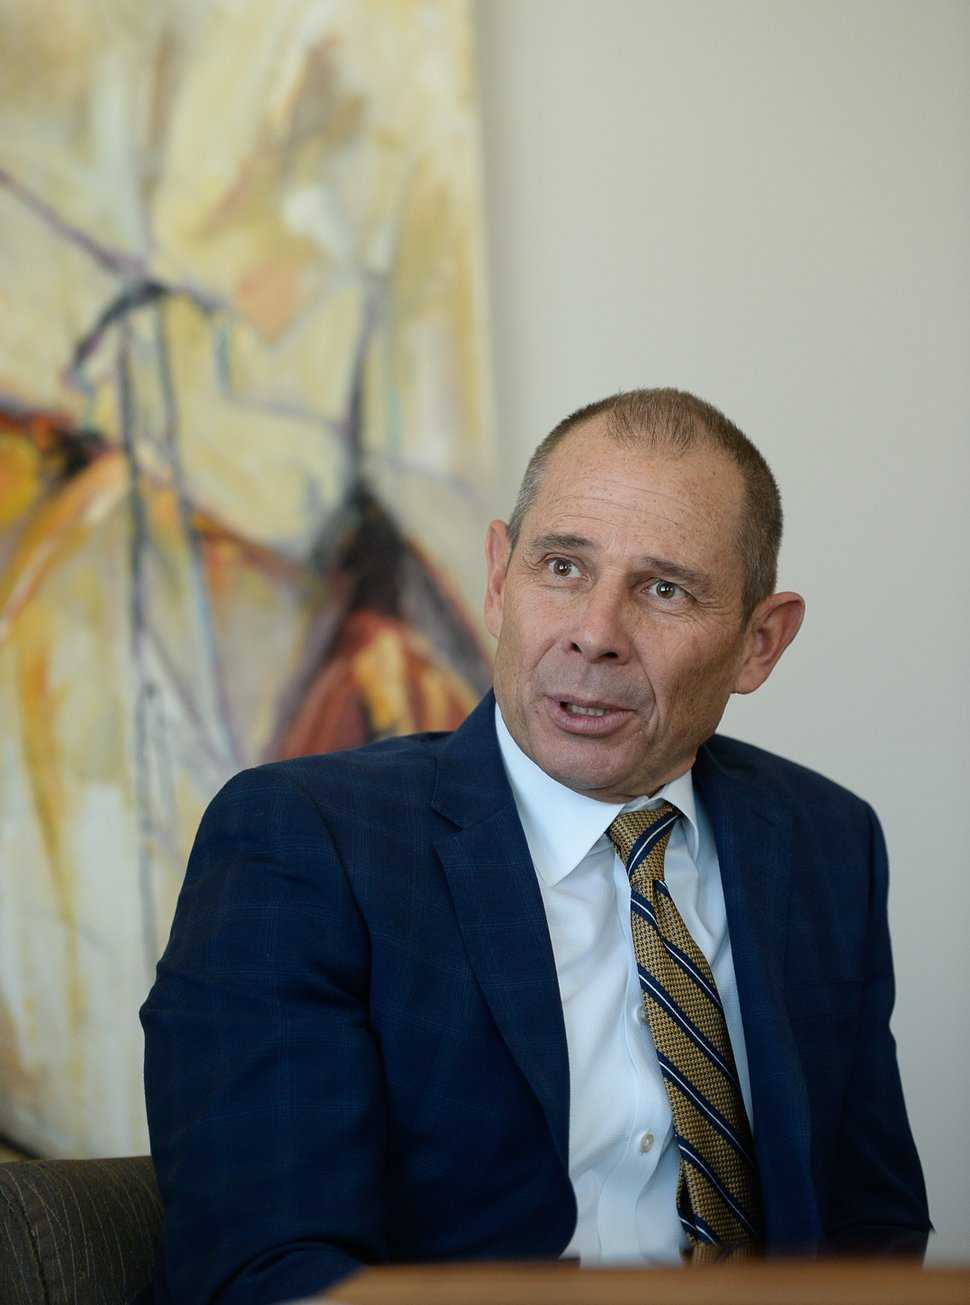 (Francisco Kjolseth | The Salt Lake Tribune) John Curtis speaks to the Salt Lake Tribune Editorial Board on Tuesday, Oct. 10, 2017.